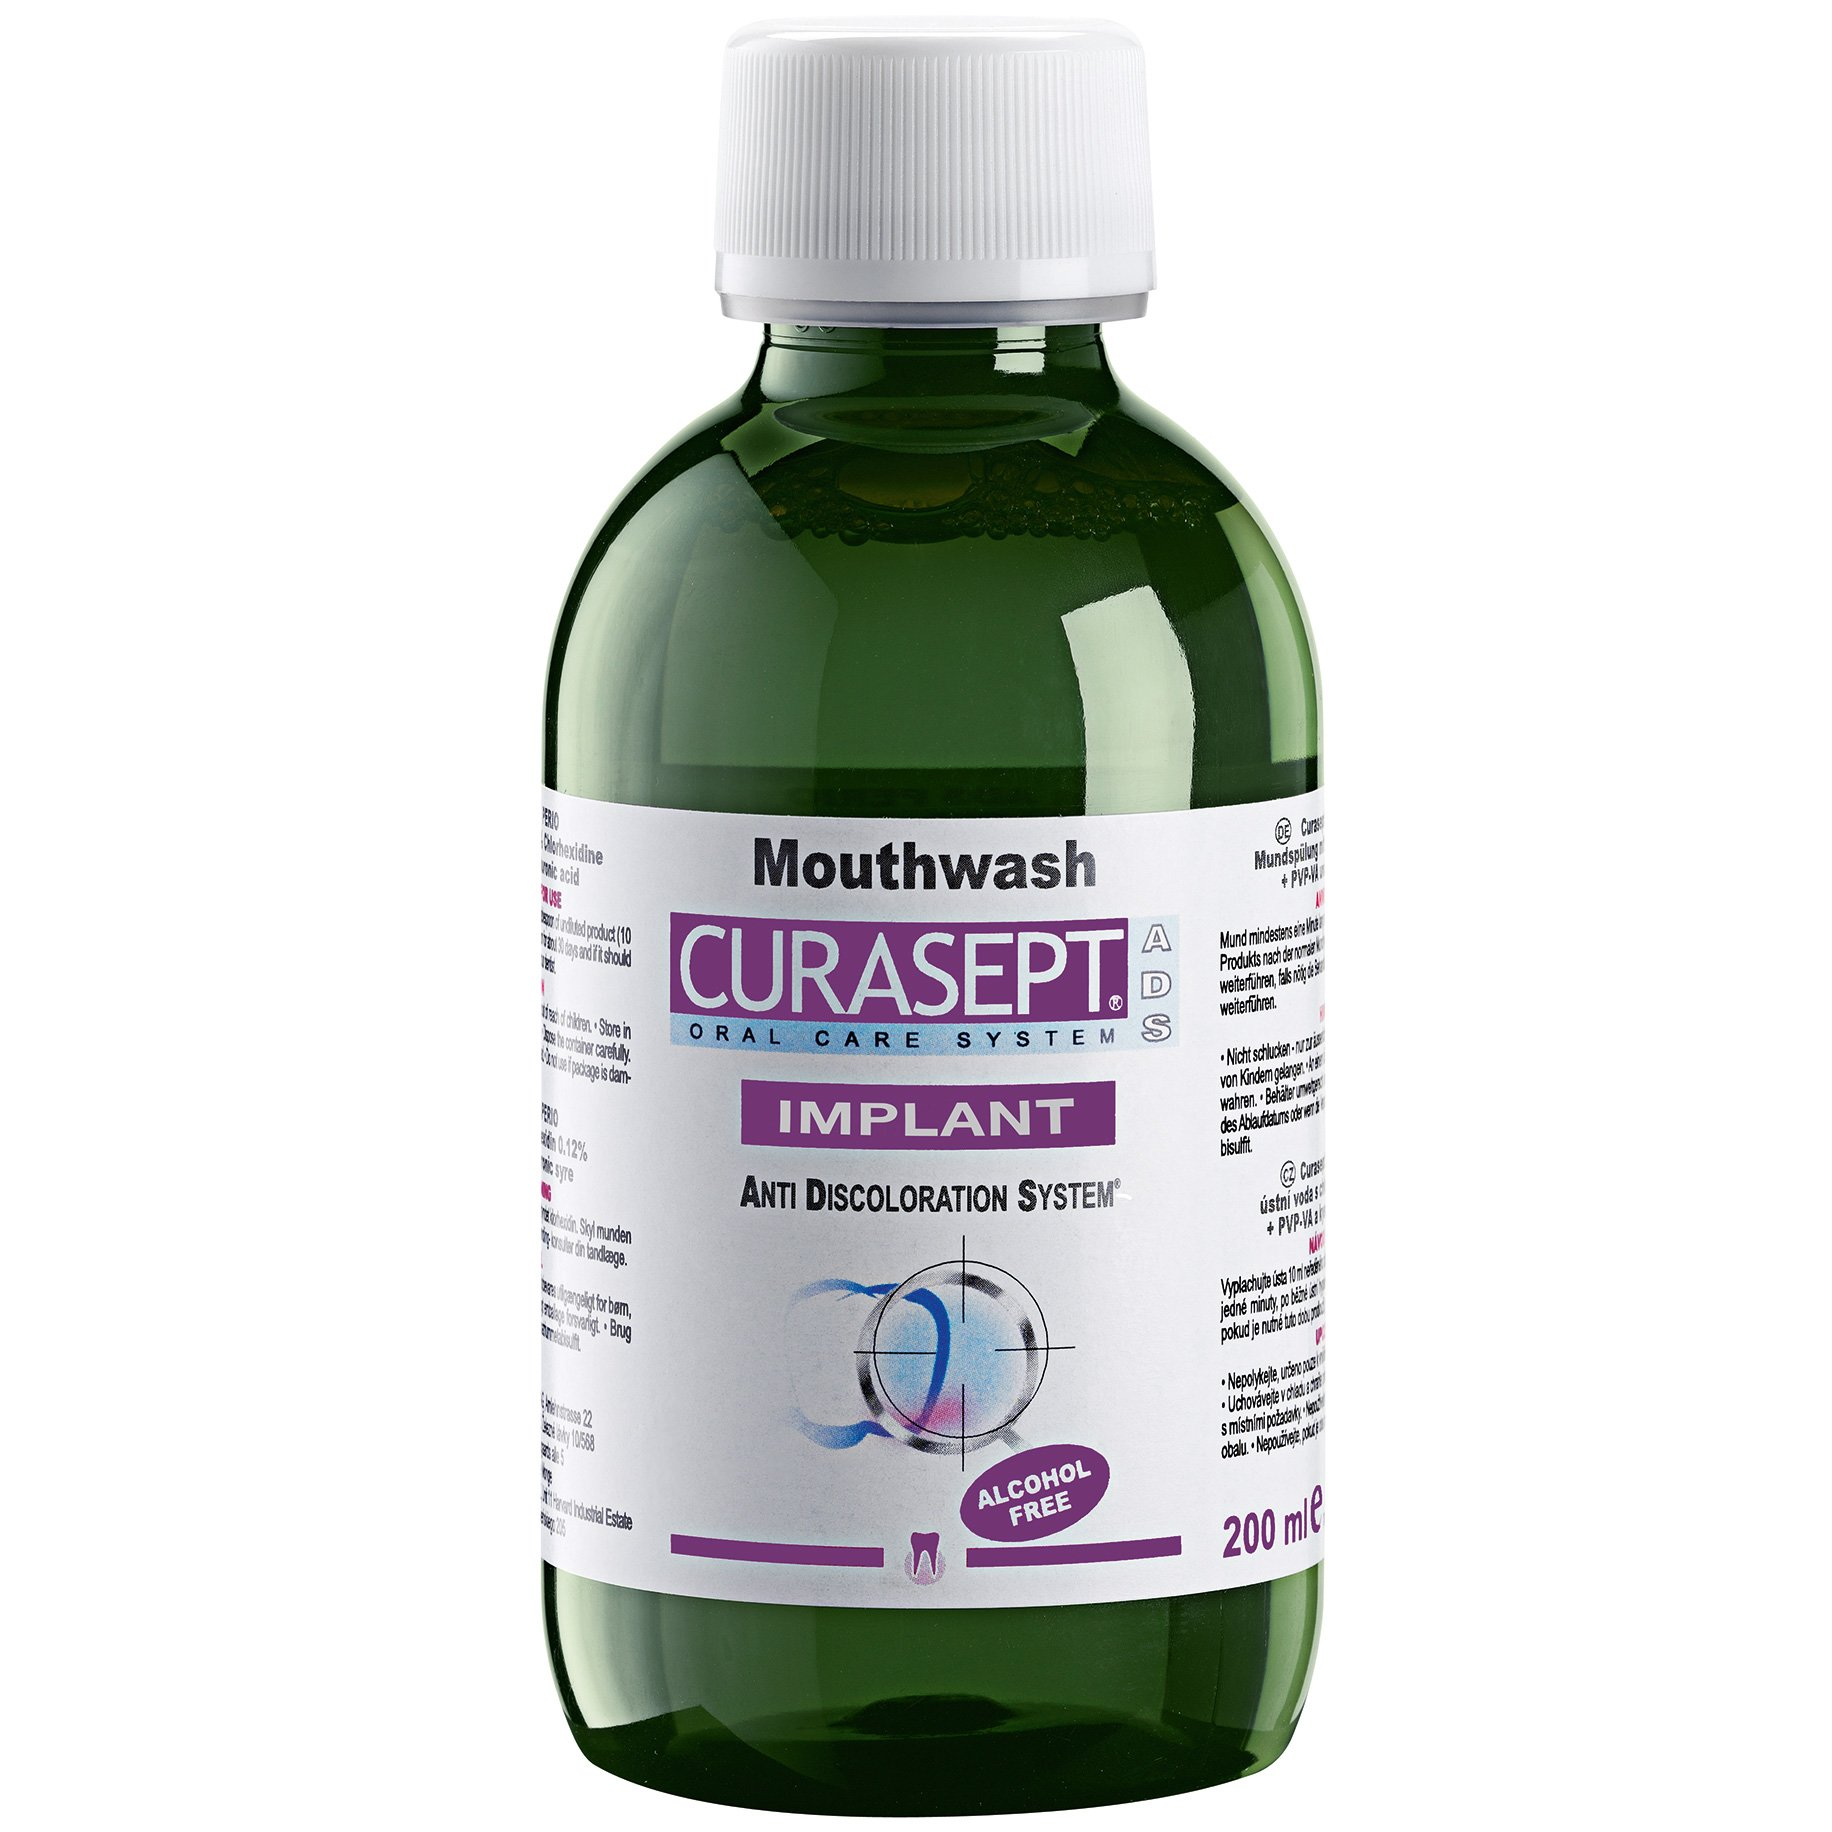 Curasept ADS Mouthwash Implant Στοματικό Διάλυμα Χλωρεξιδίνης 0.20% 200ml